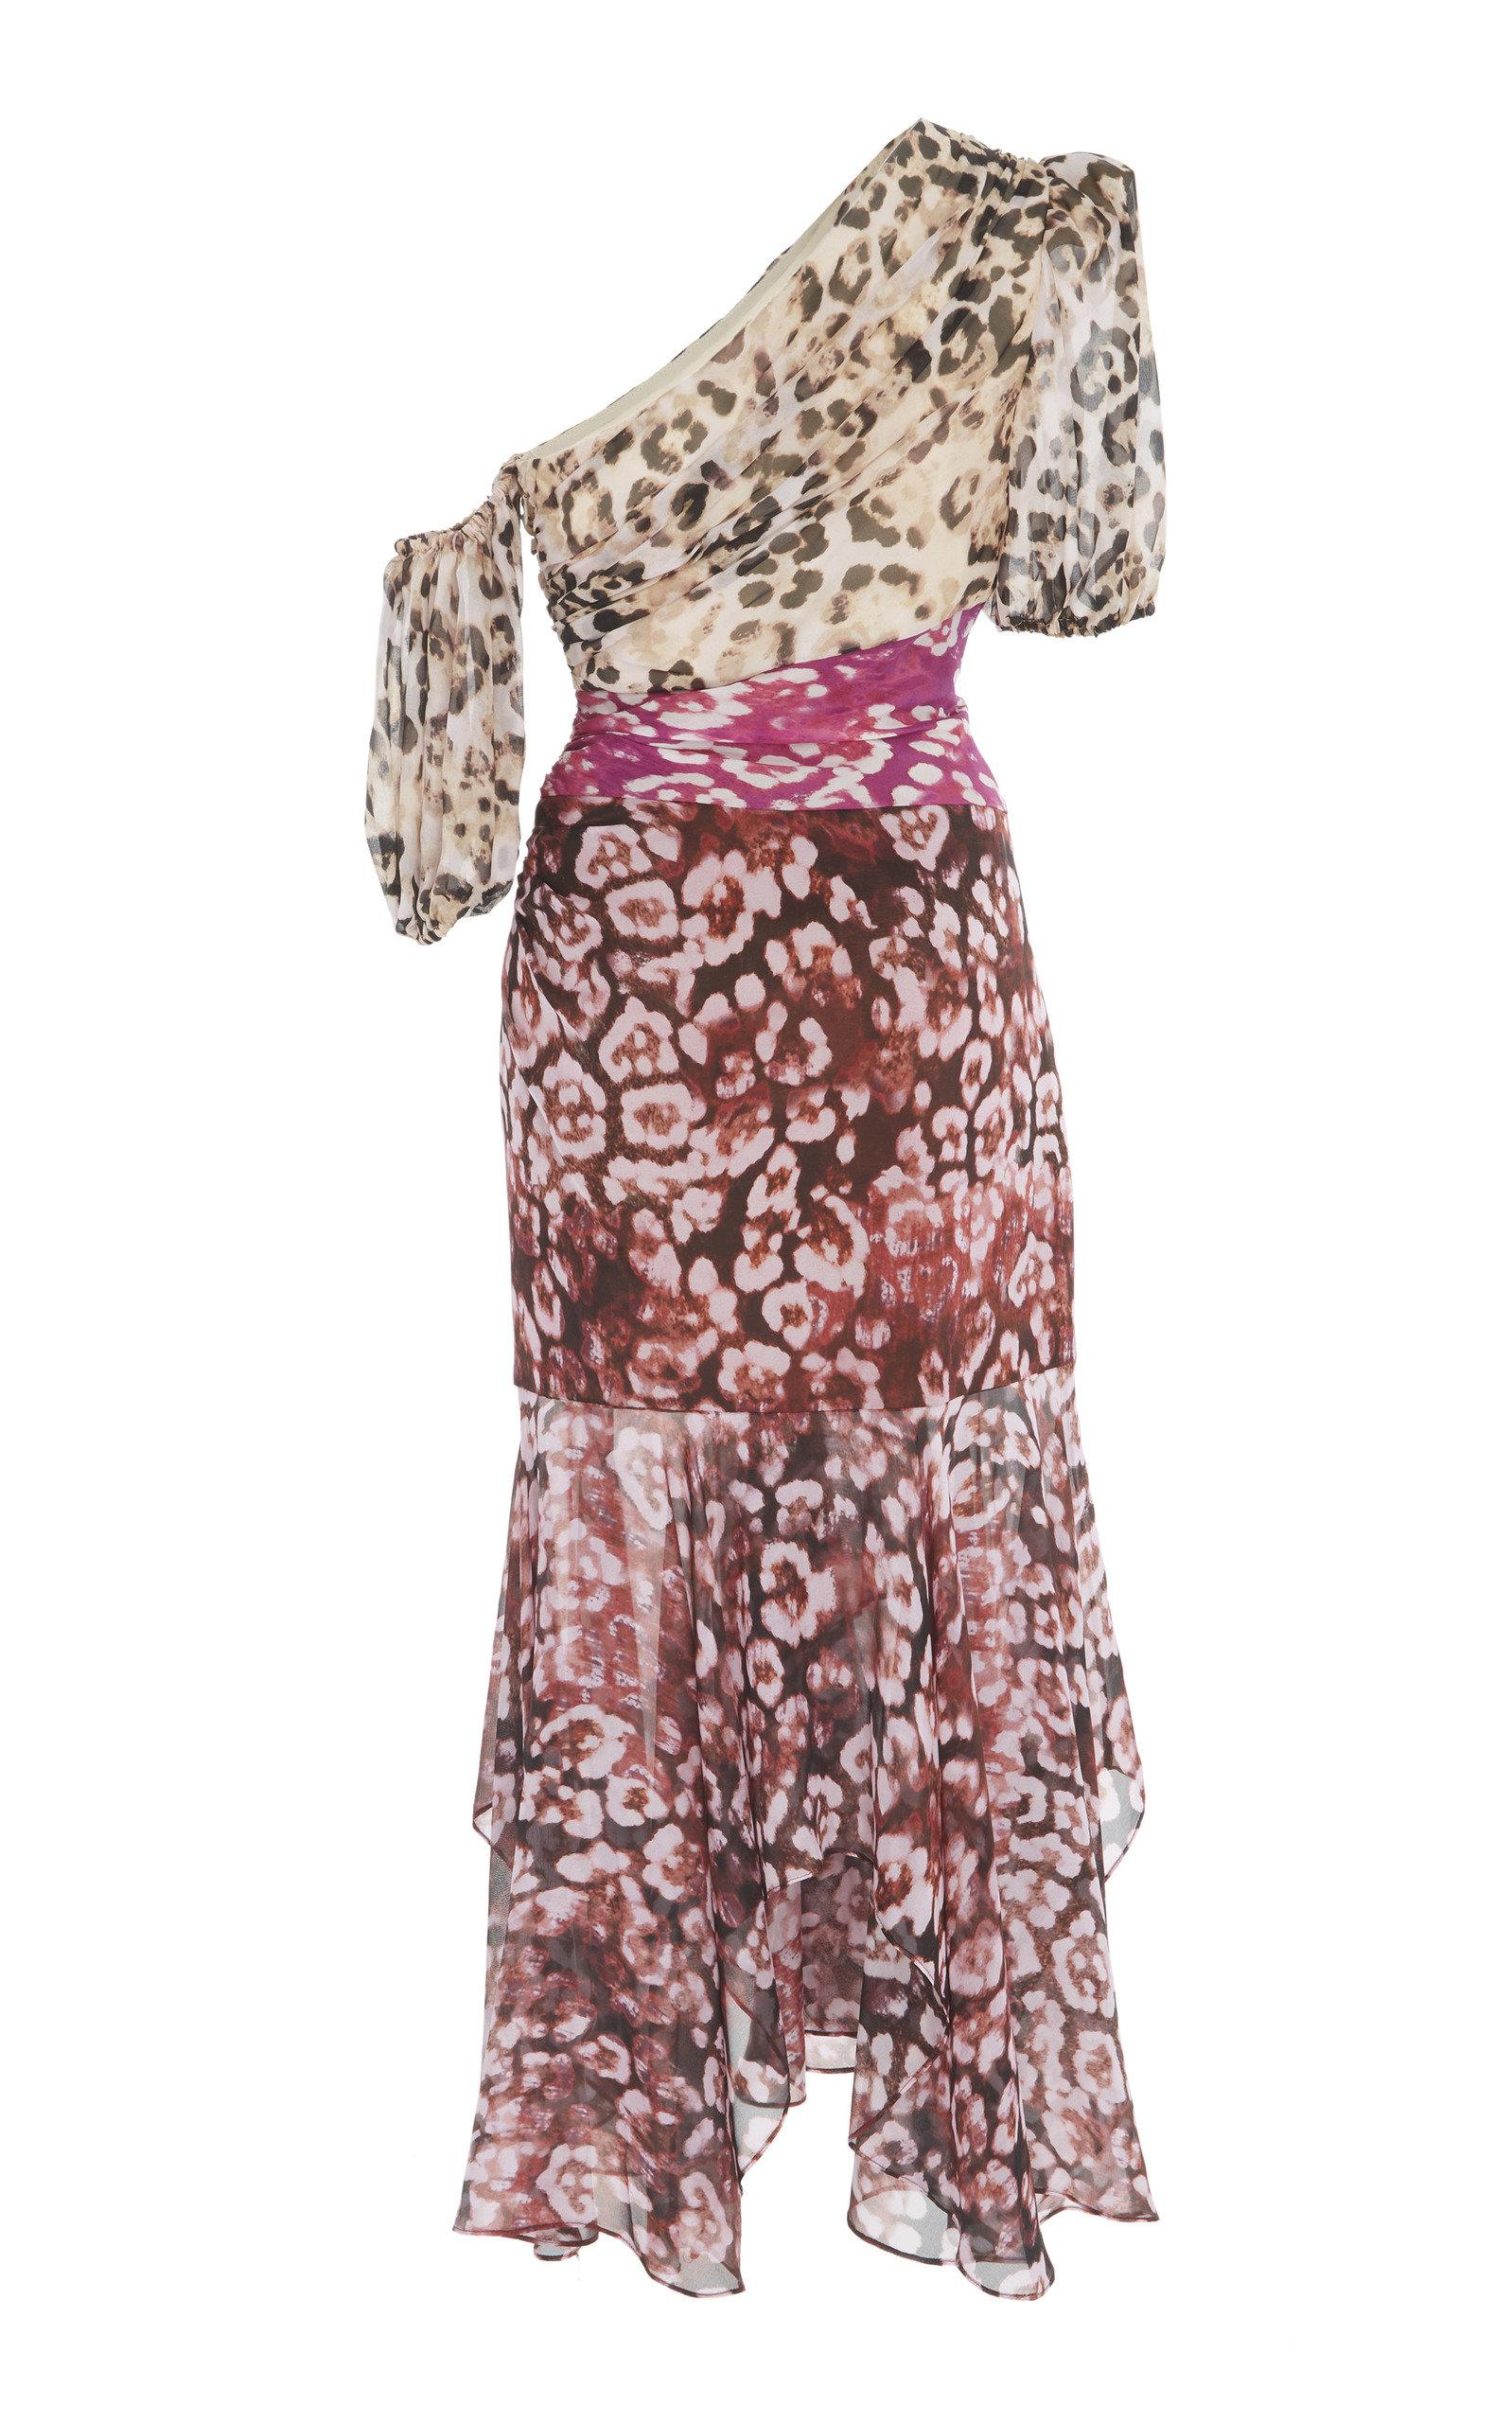 98379fc45e AMURJaylah One-Shoulder Printed Silk-Chiffon Midi Dress. CLOSE. Loading.  Loading